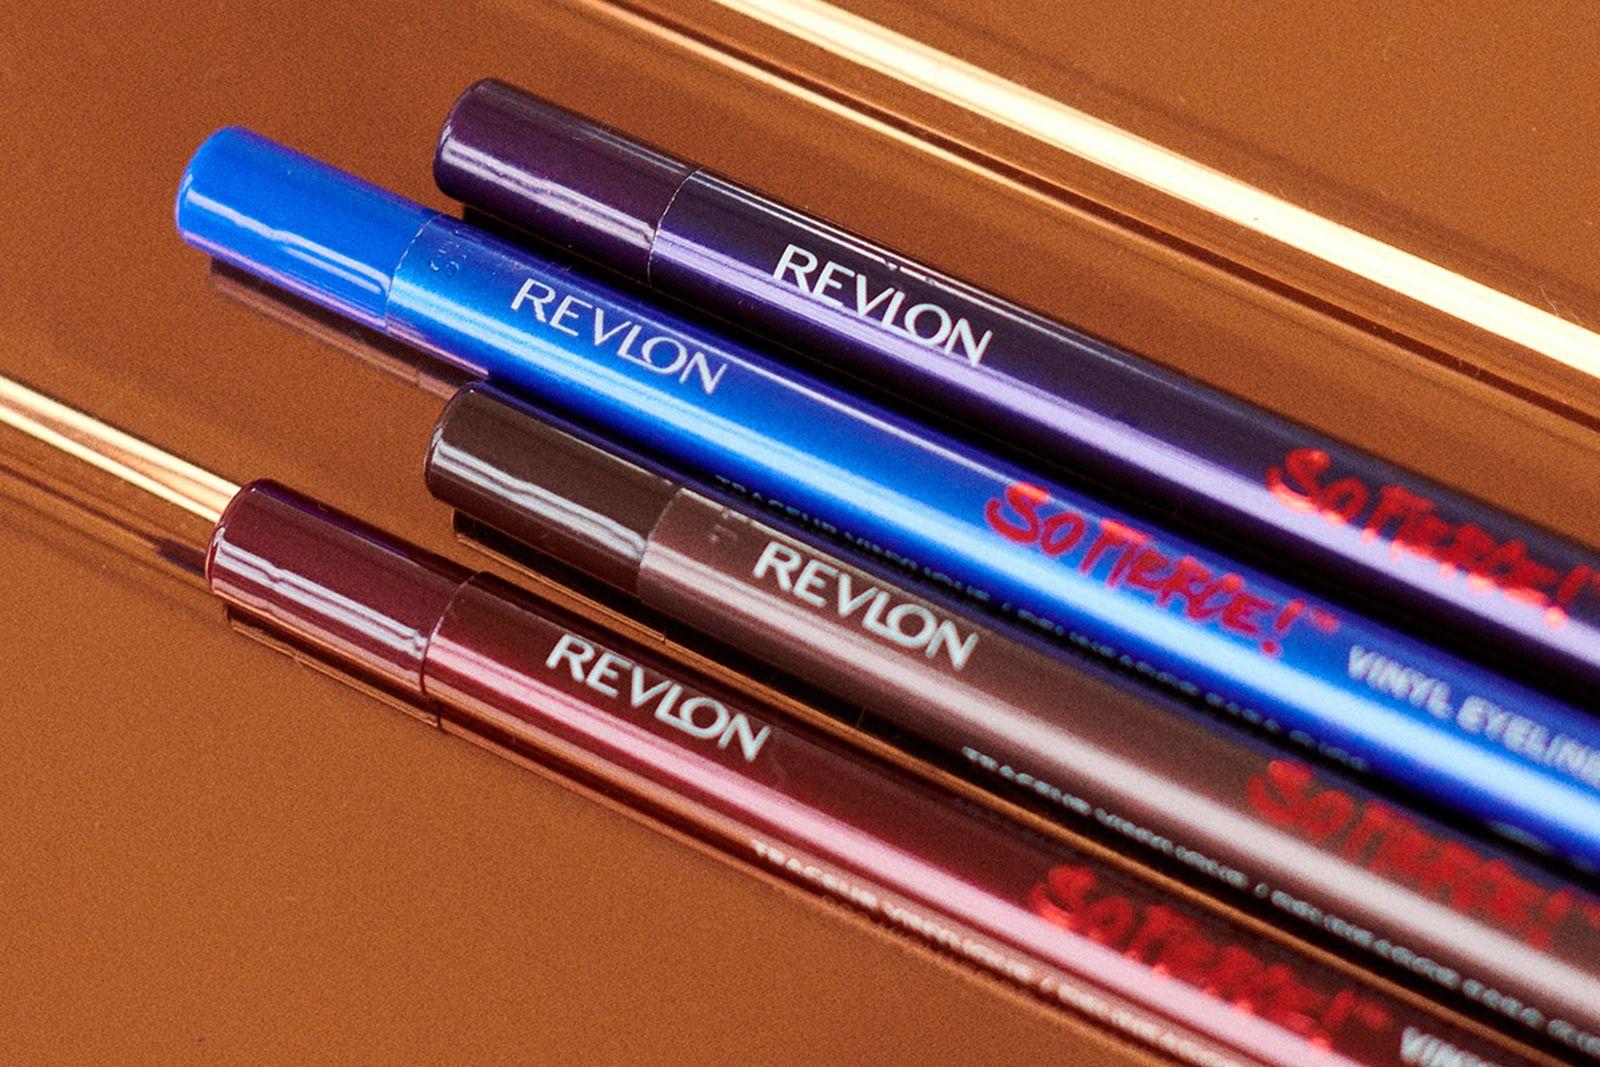 Revlon-05